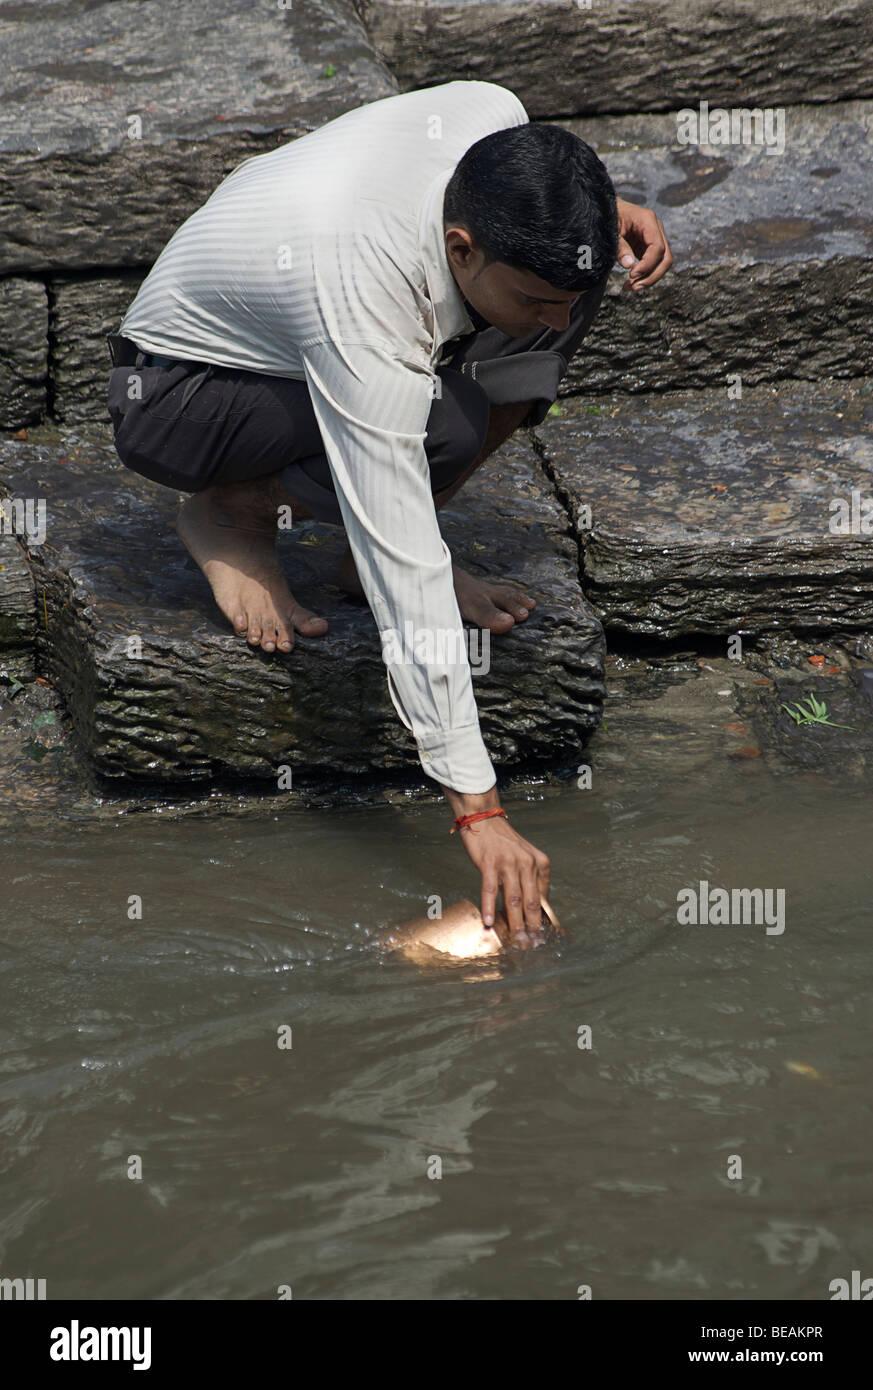 Hindu man collecting water for ritual from the Bagmati river at Pashupatinath, Kathmandu, Nepal. - Stock Image